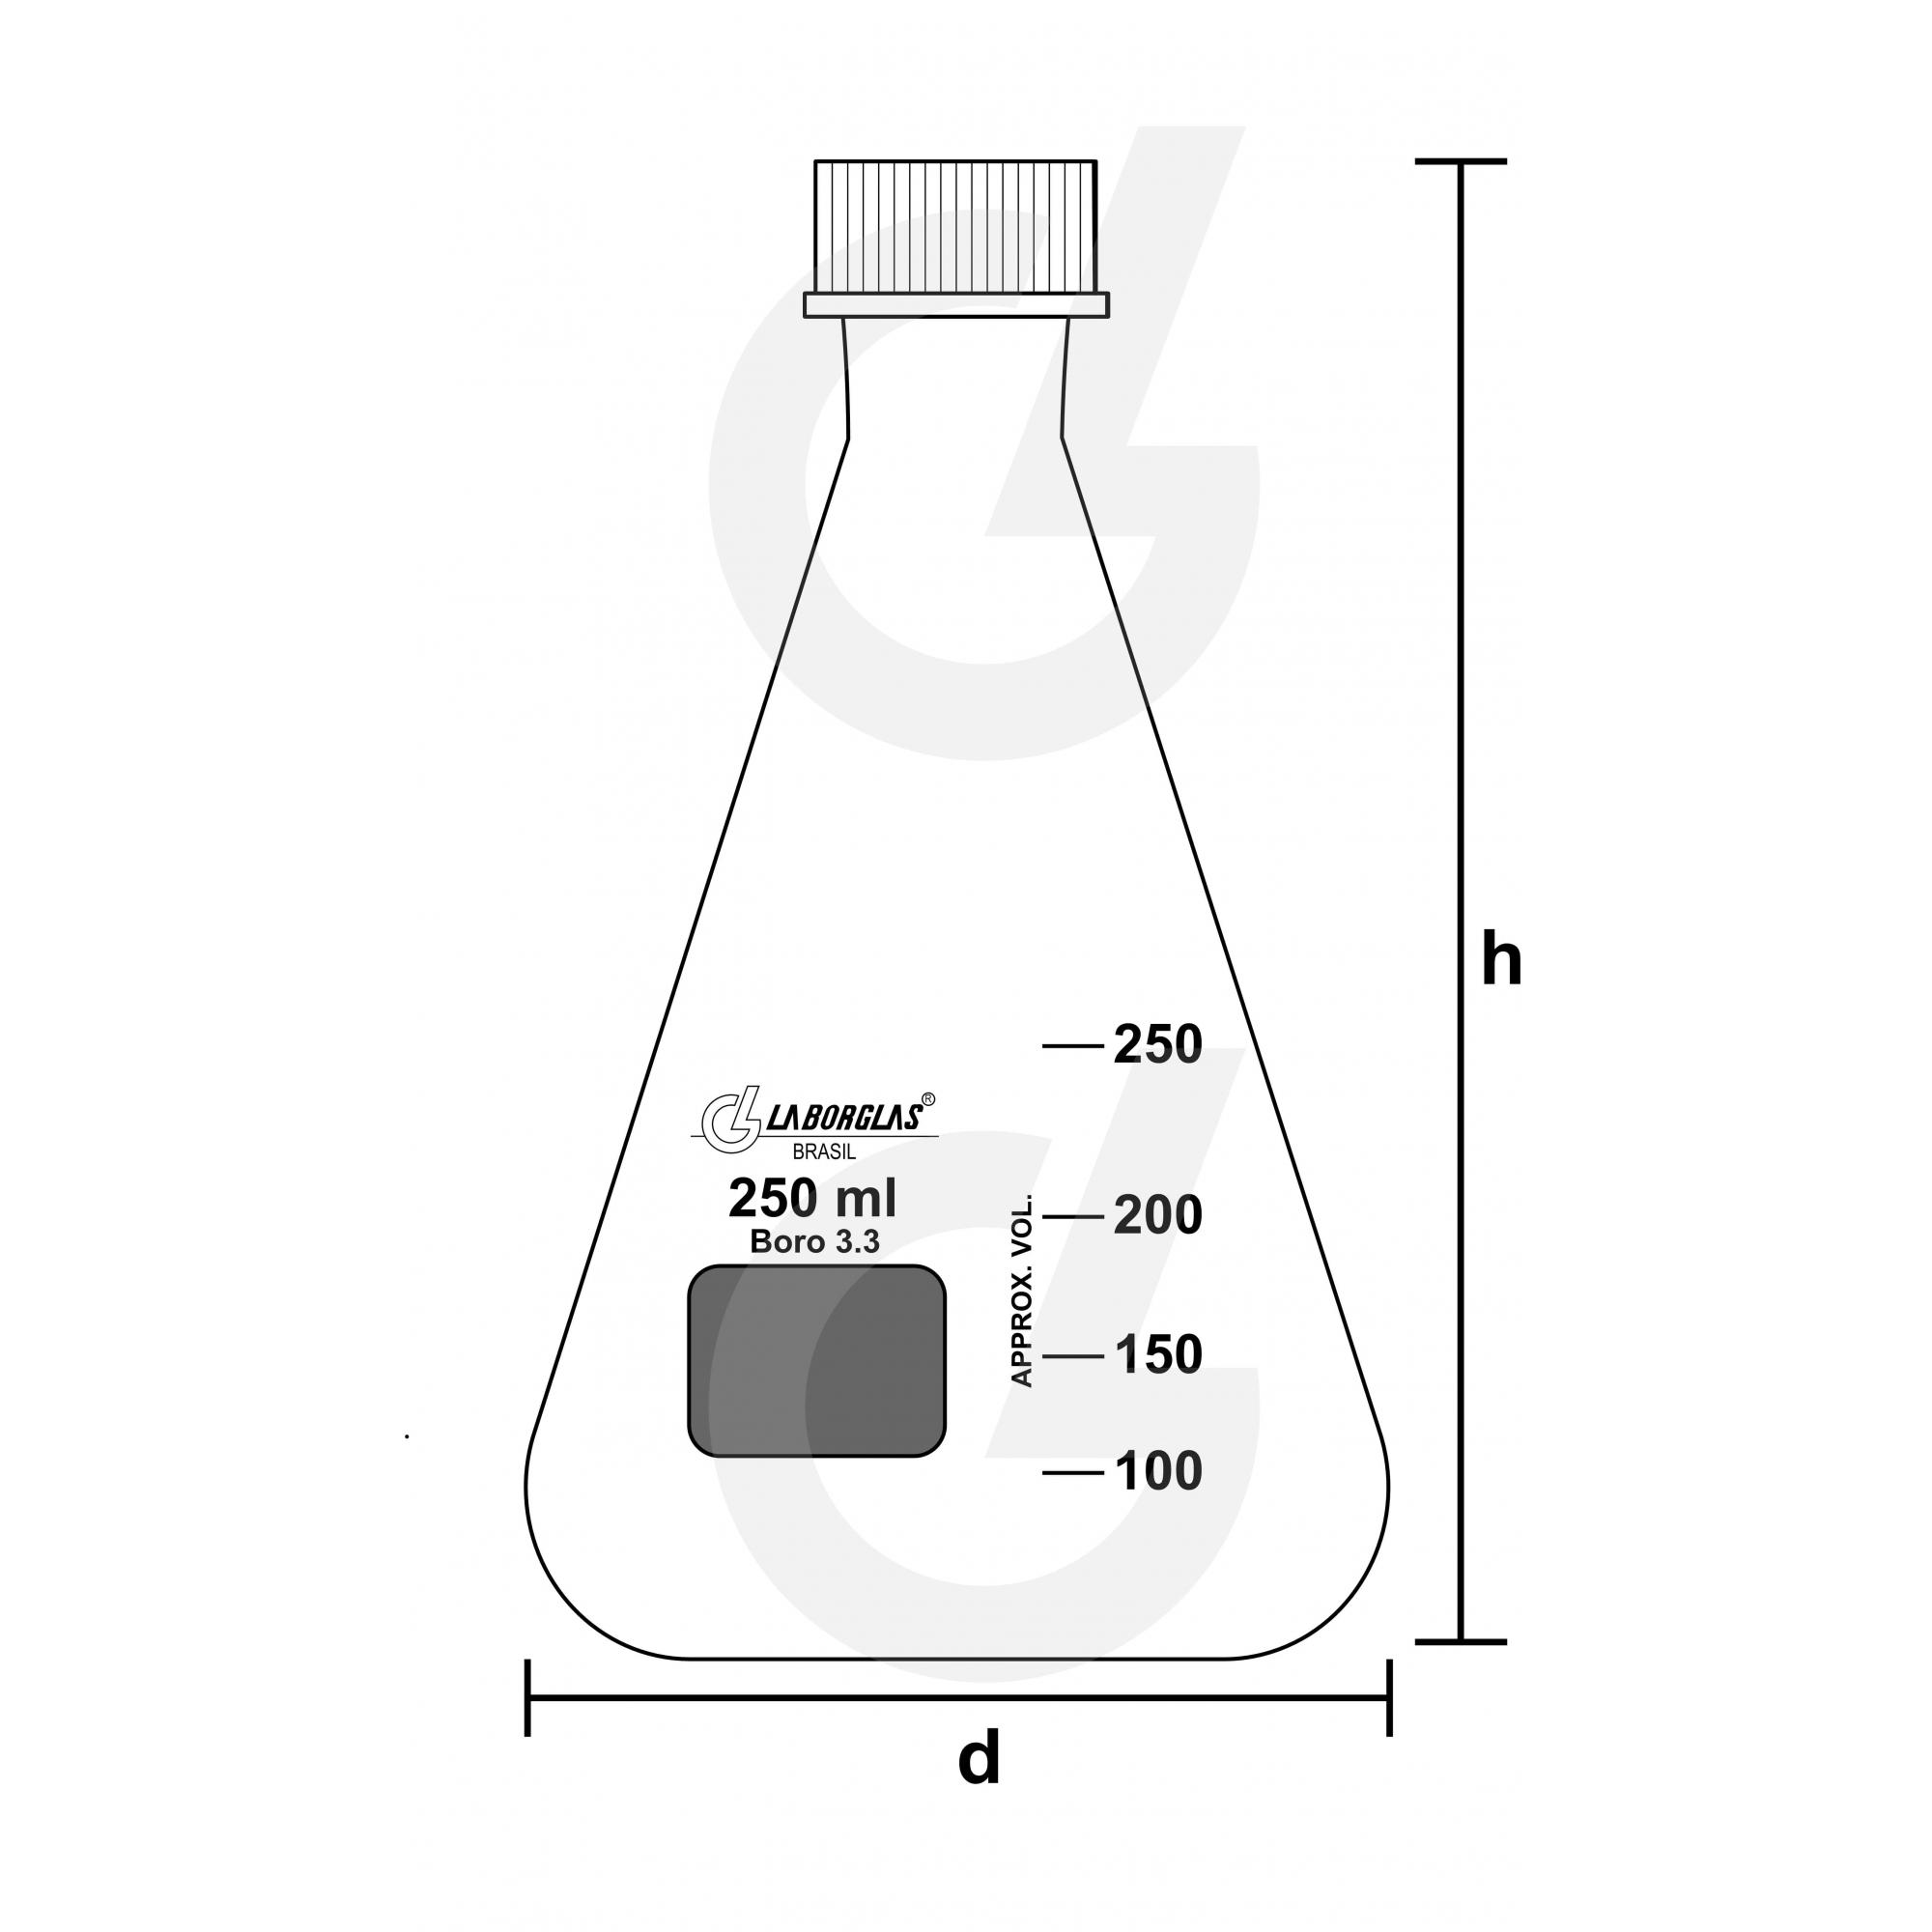 FRASCO ERLENMEYER C/ TAMPA ROSCA 2000 ML - Laborglas - Cód. 91216634